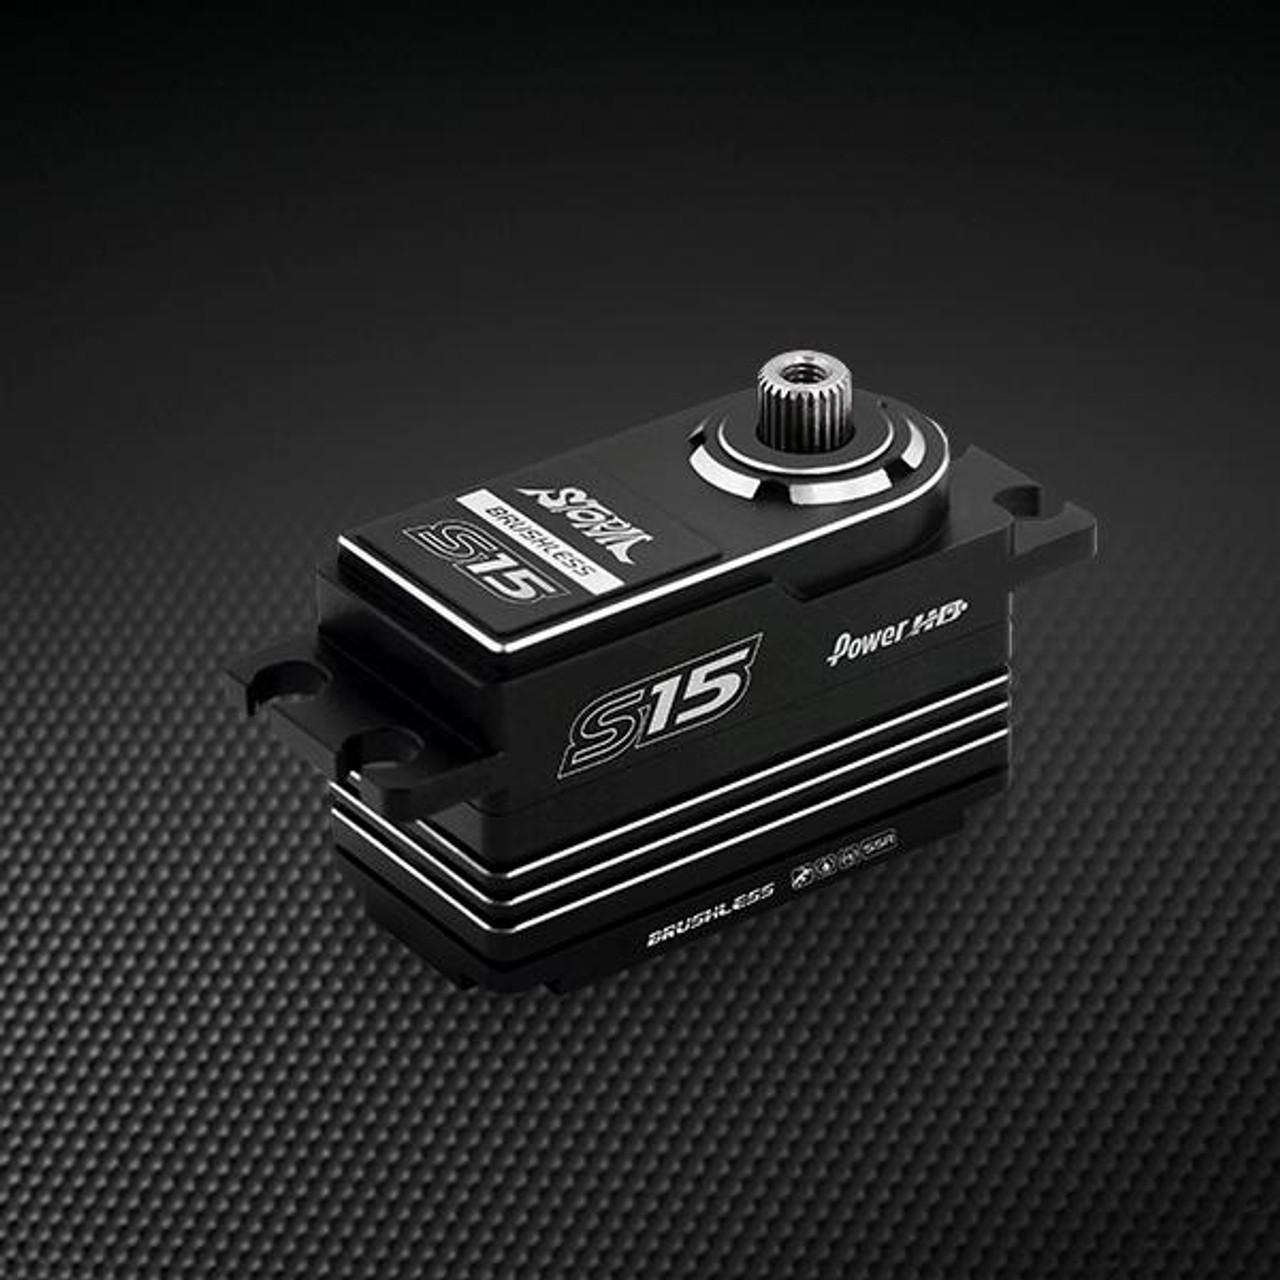 S15 (Silver) Power HD Low Pro HV Brushless Digital Servo